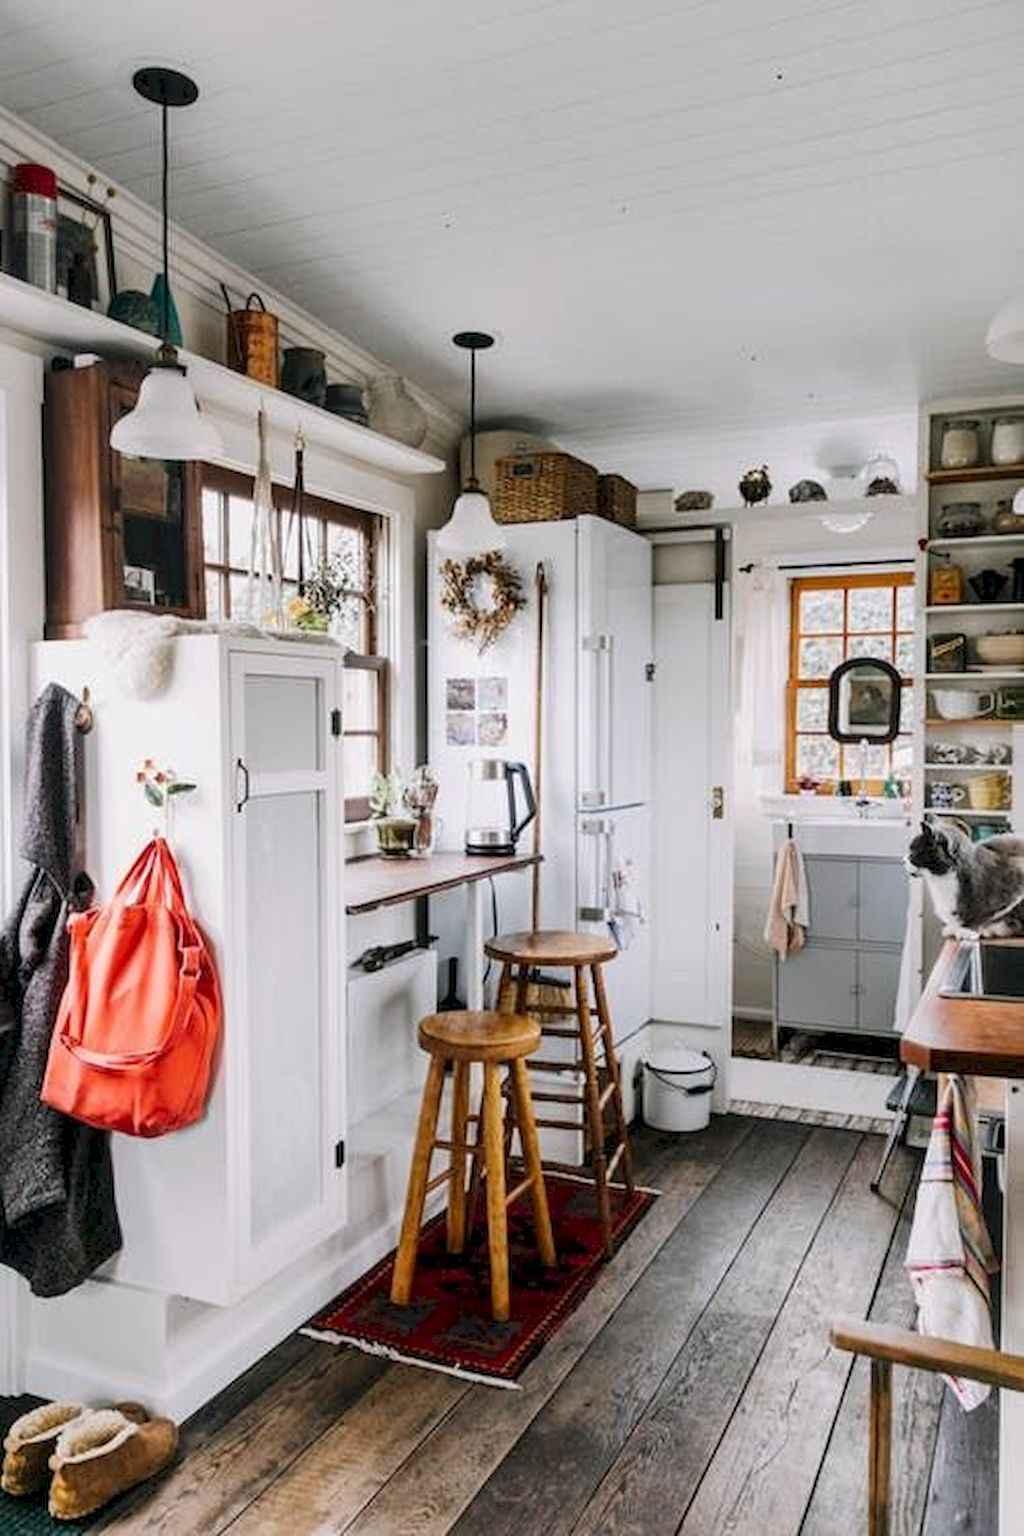 48 Tiny House Kitchen Storage Organization and Tips Ideas